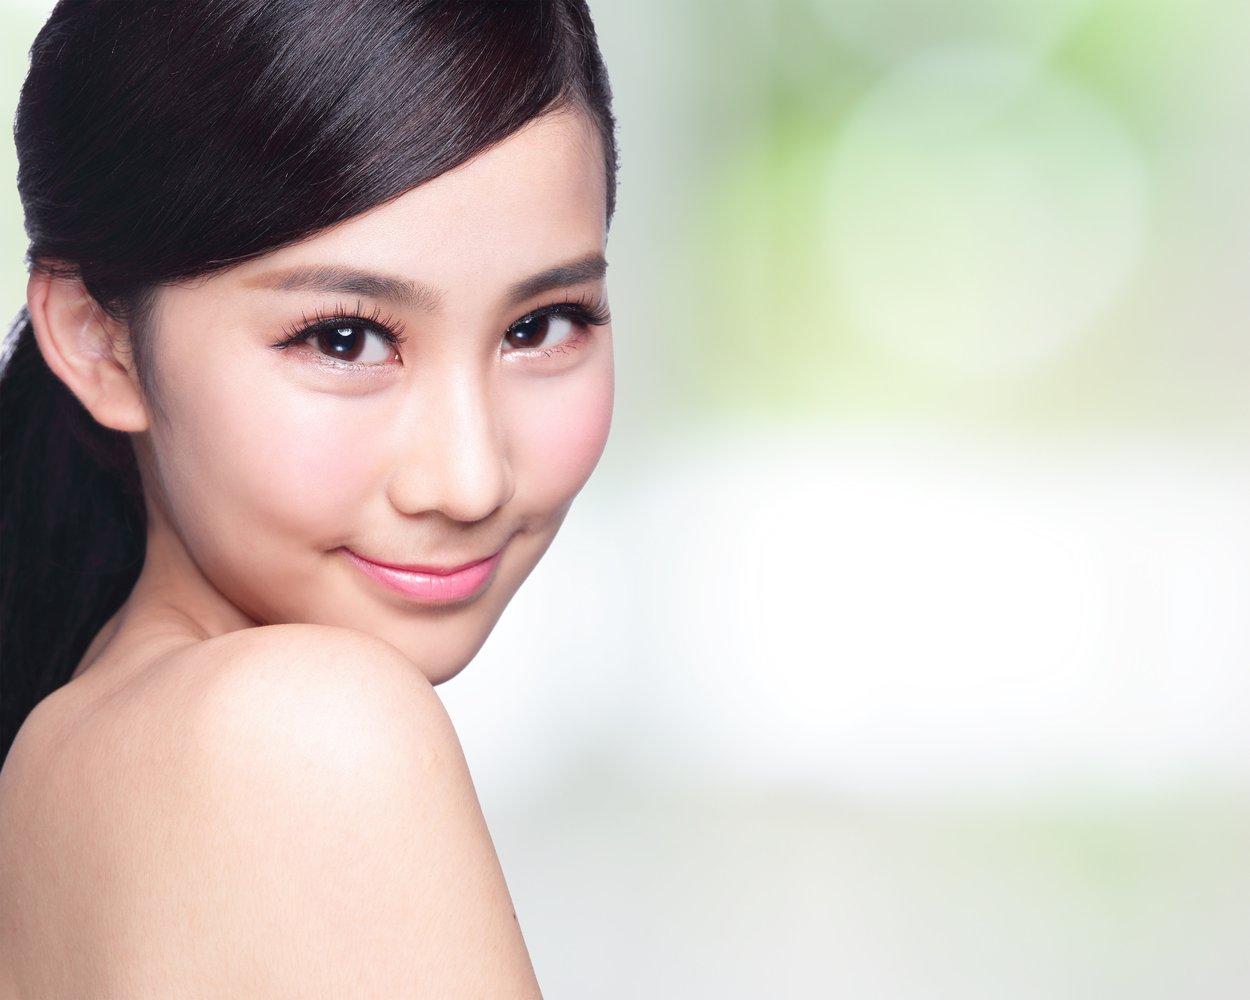 bigstock-Beautiful-Skin-Care-Woman-Face-75445546